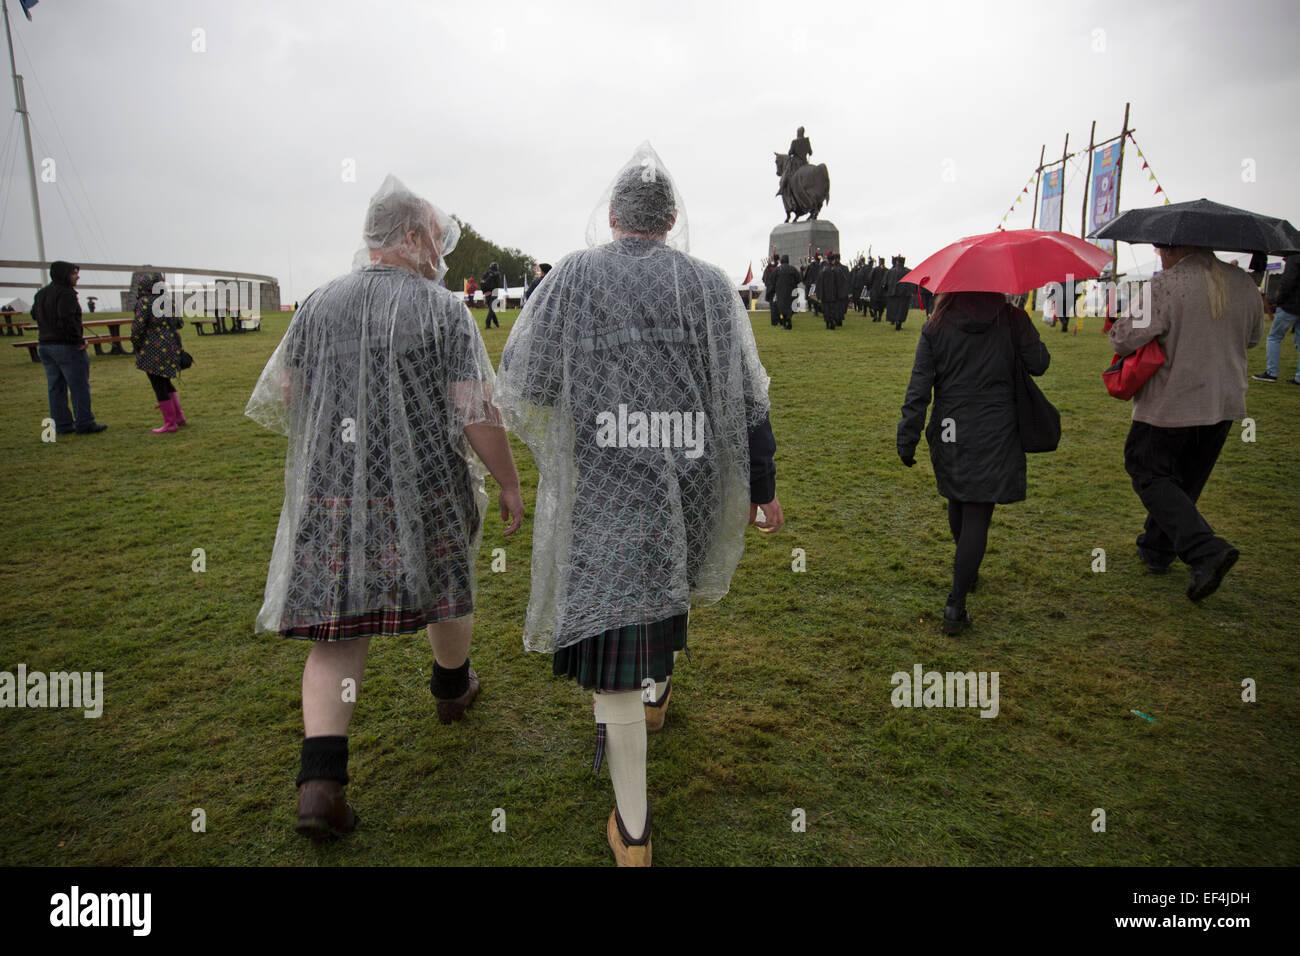 Two men dressed in kilts and rain ponchos during events at Bannockburn Live, at Bannockburn, Stirlingshire. - Stock Image